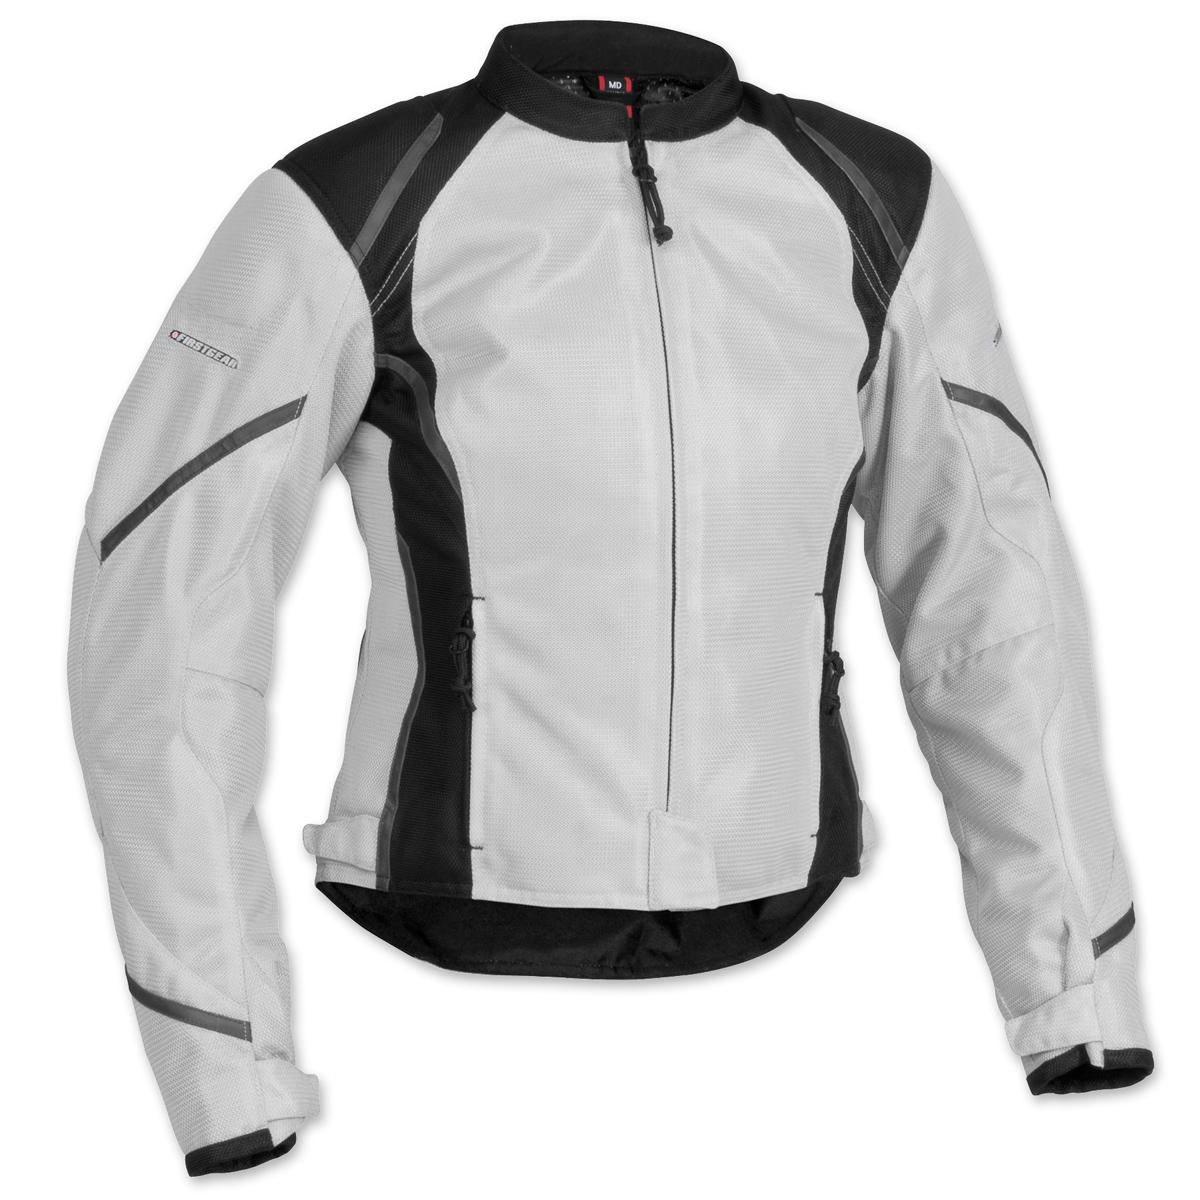 Firstgear Women's Mesh Tex Silver Jacket